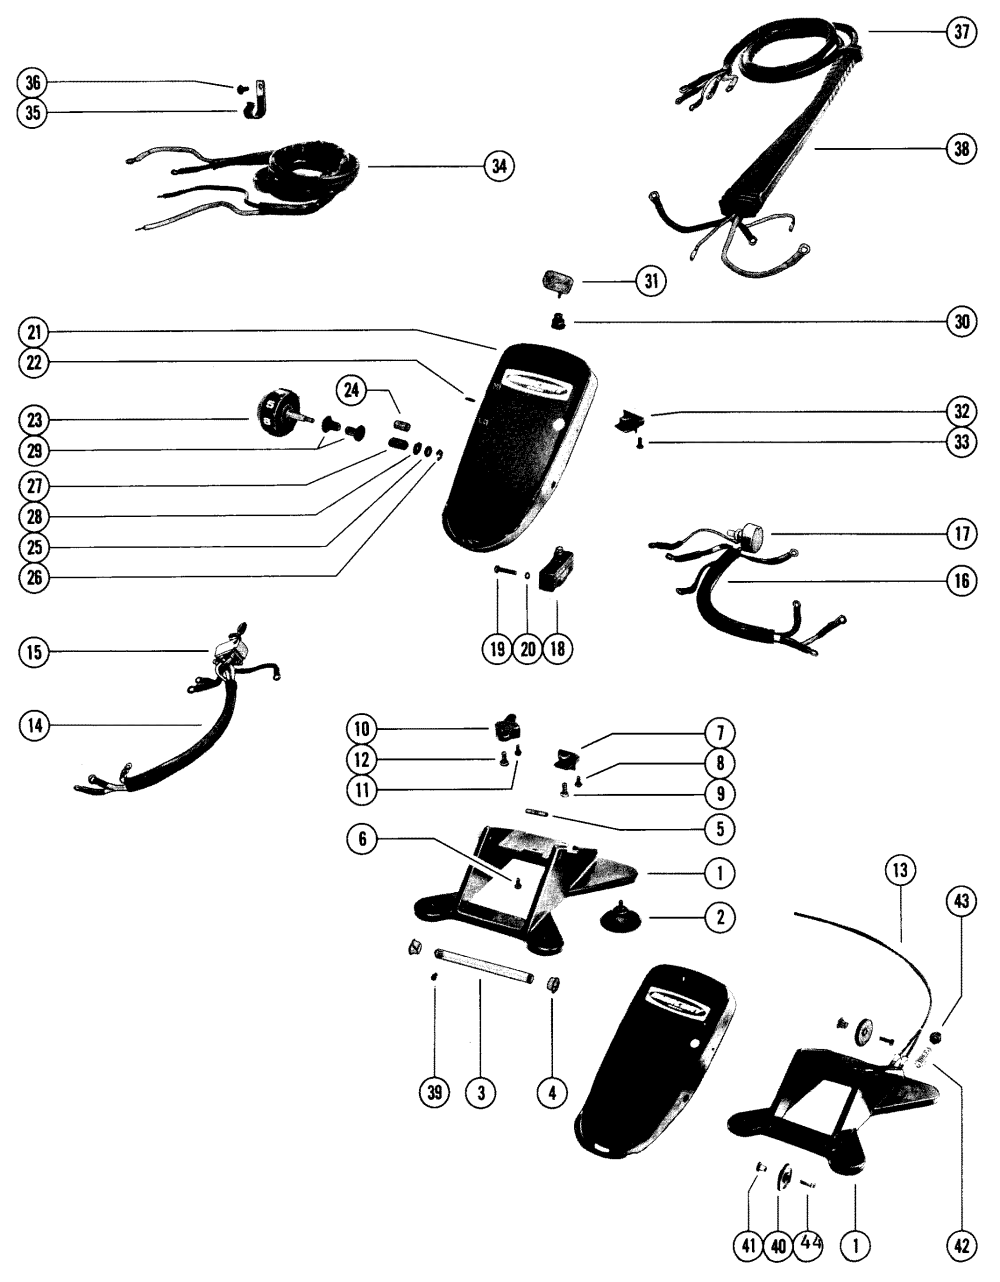 medium resolution of mercury trolling motor thruster 5147772 thru 5516584 wiring 75 mercury outboard wiring diagram mercury thruster wiring diagram